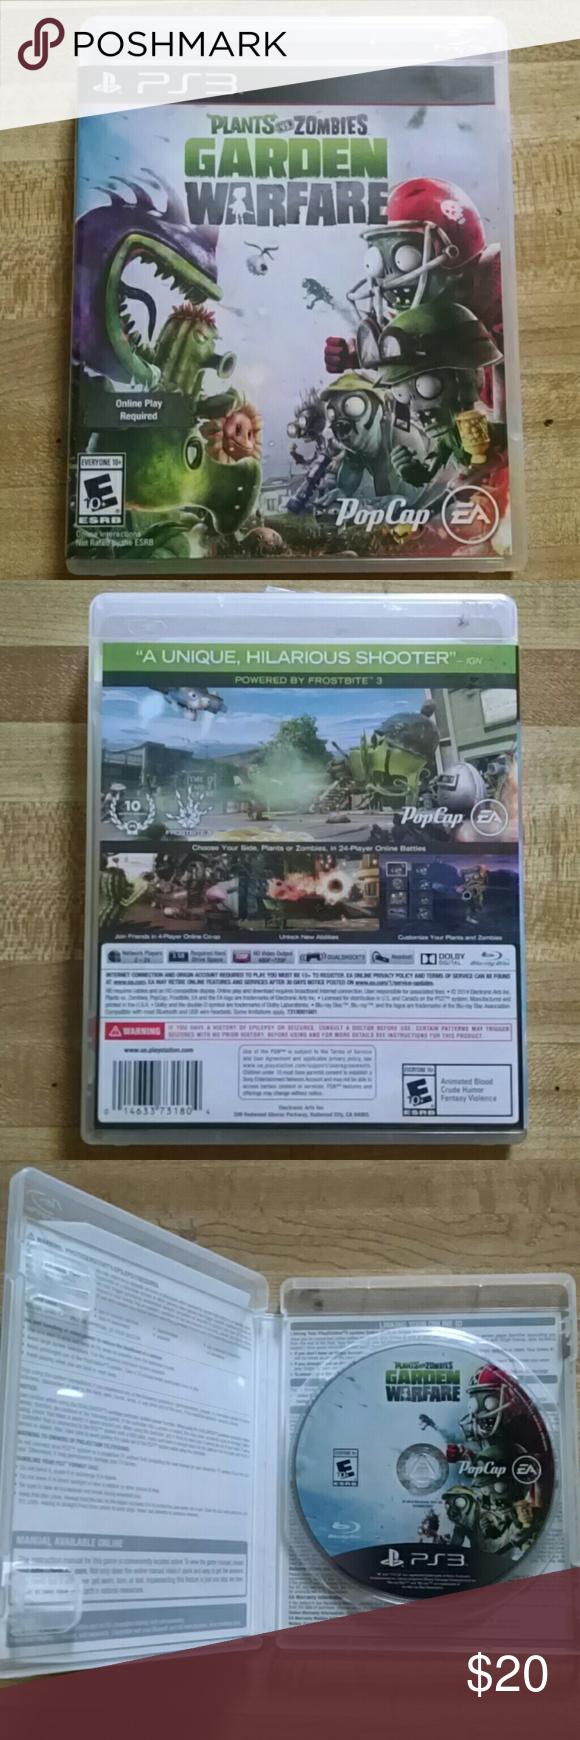 Plants vs Zombies garden warfare PS3 Game Plants vs